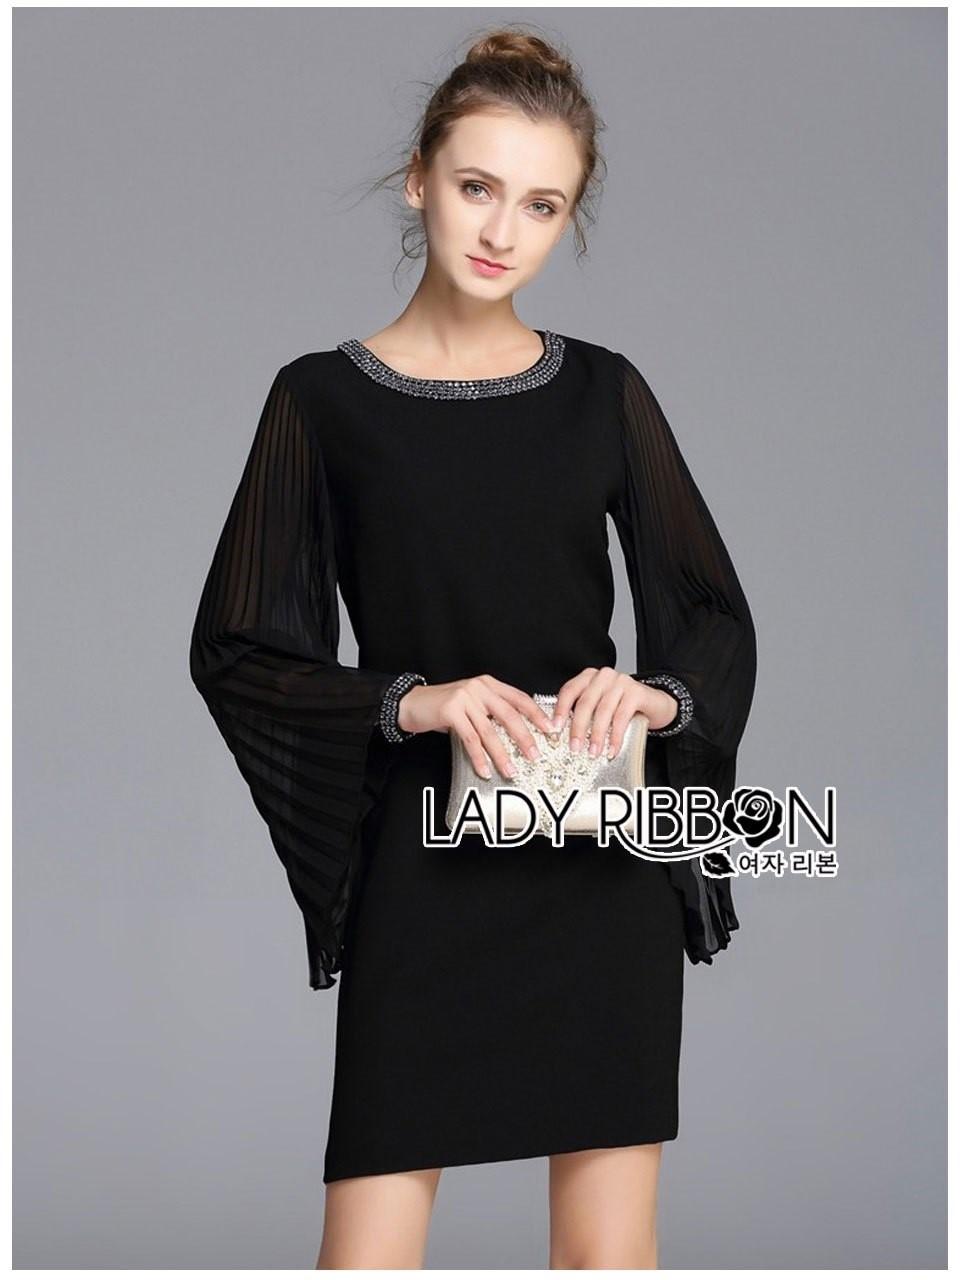 &#x1F380 Lady Ribbon's Made &#x1F380 Lady Katie Allure Embellished Pleated-Sleeve Black Dress